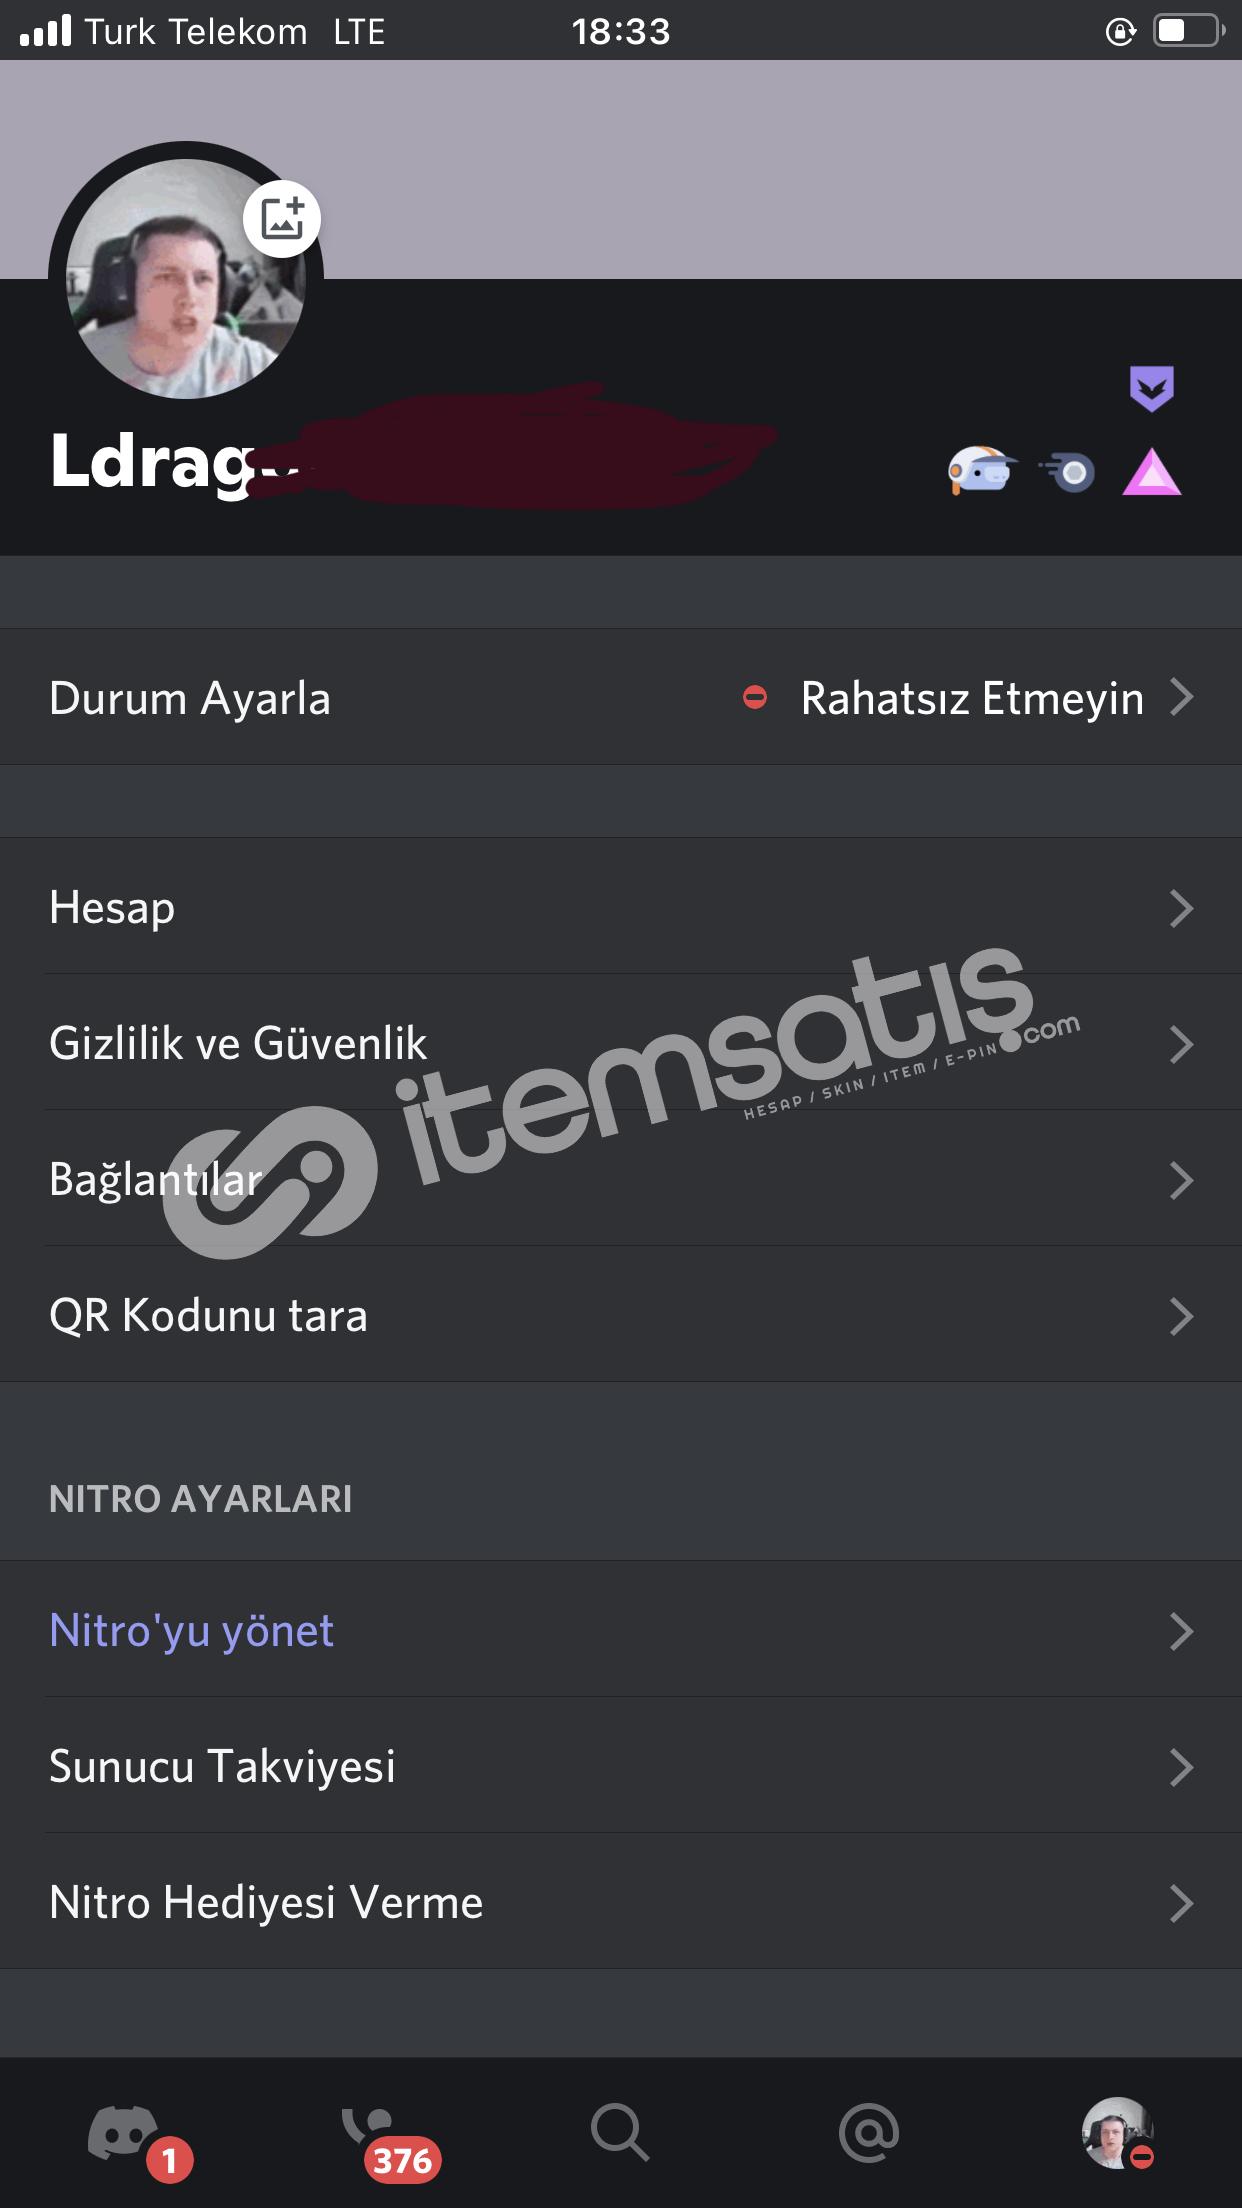 DİSCORD EARLY HESAP + 17 AYLIK BOOSTLU NİTRO